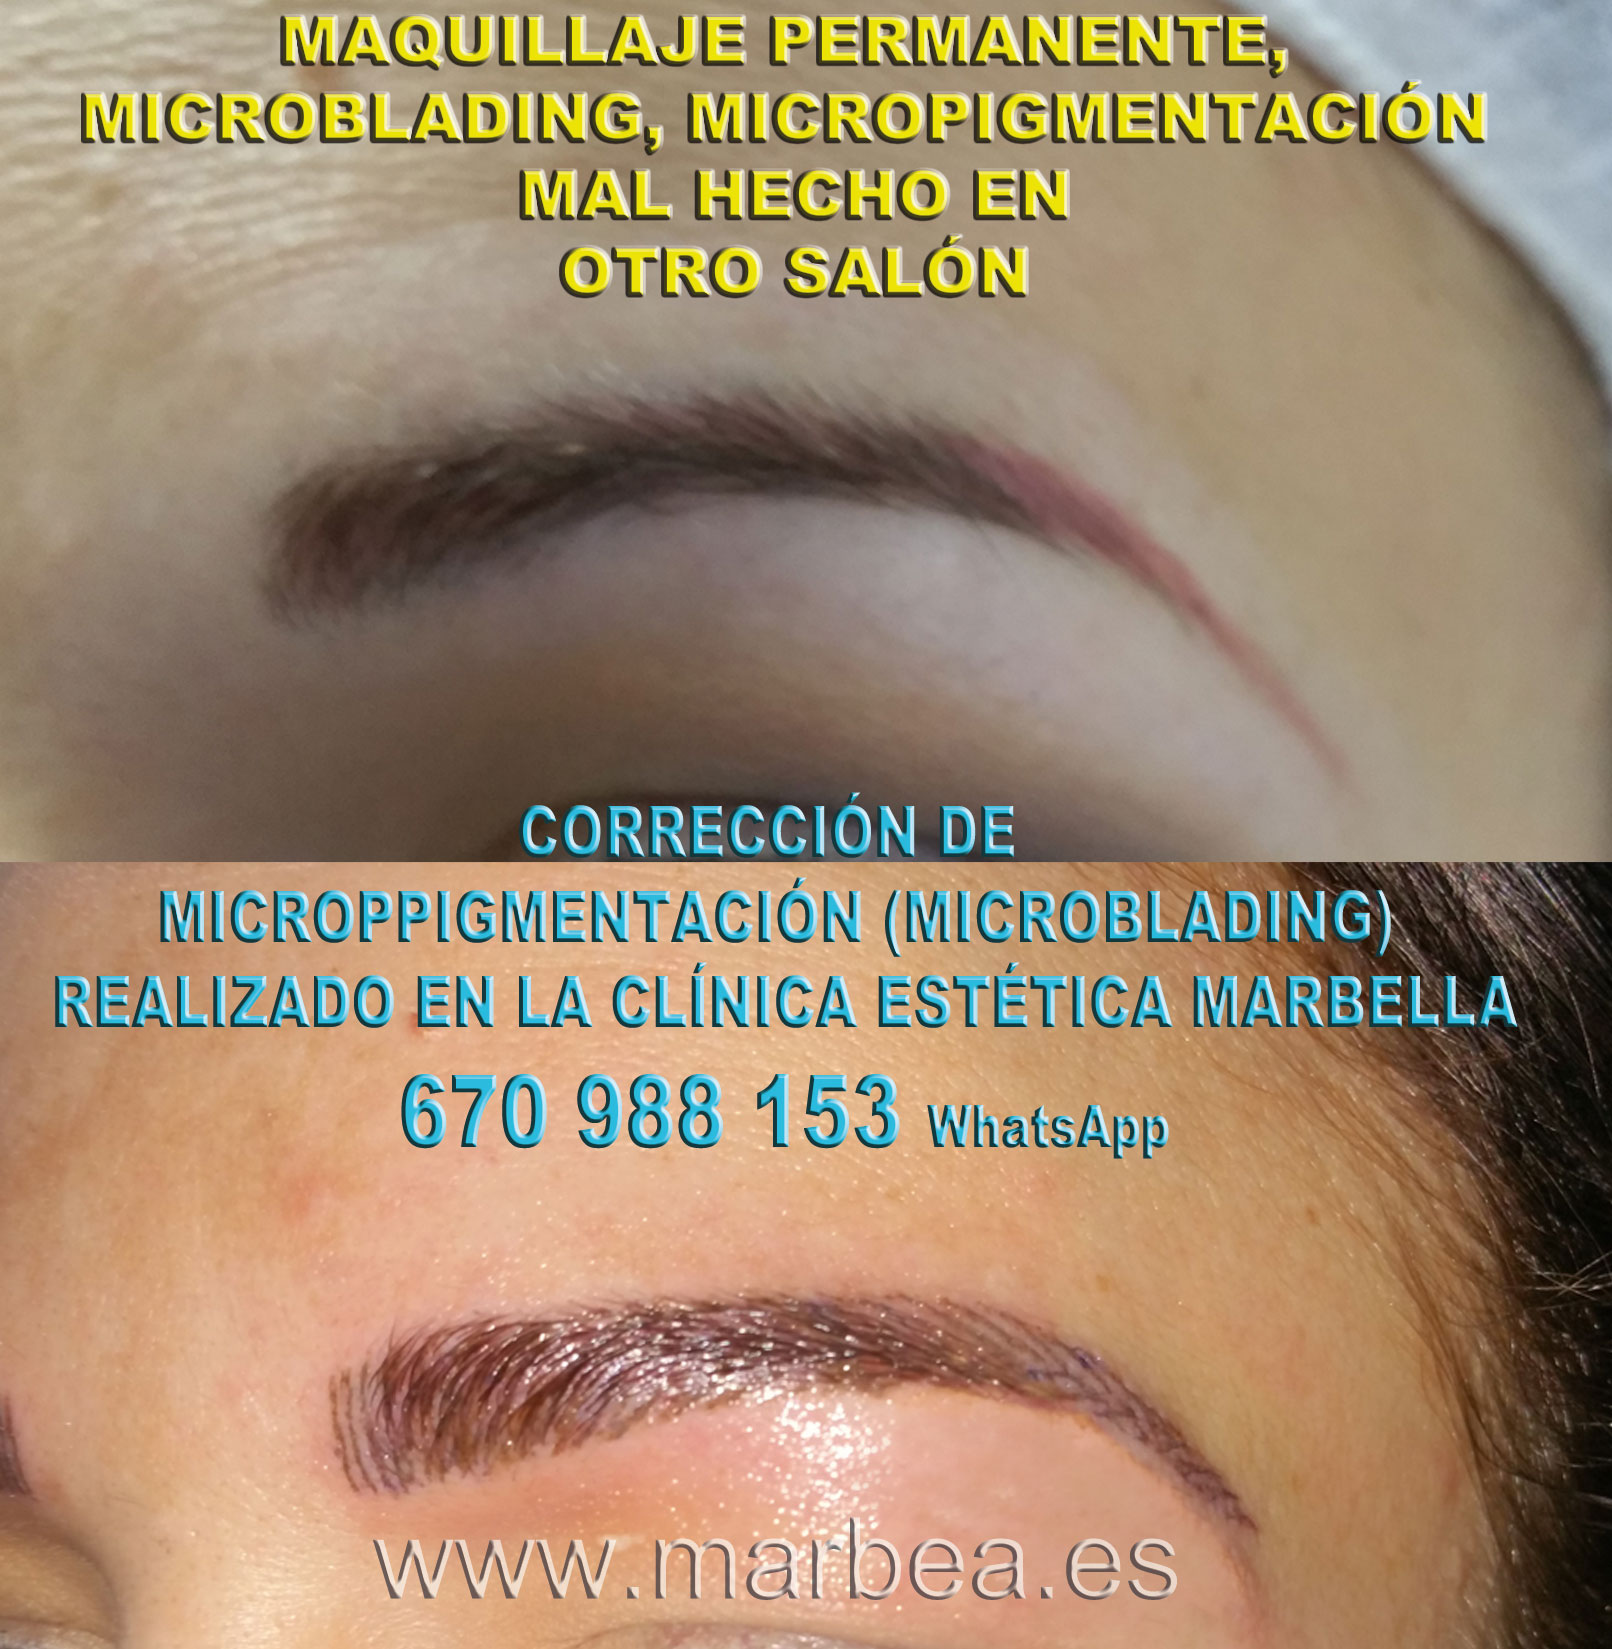 ELIMINAR TATUAJE CEJAS clínica estética maquillaje permanete entrega eliminar la micropigmentación de cejas,micropigmentación correctiva cejas mal hecha